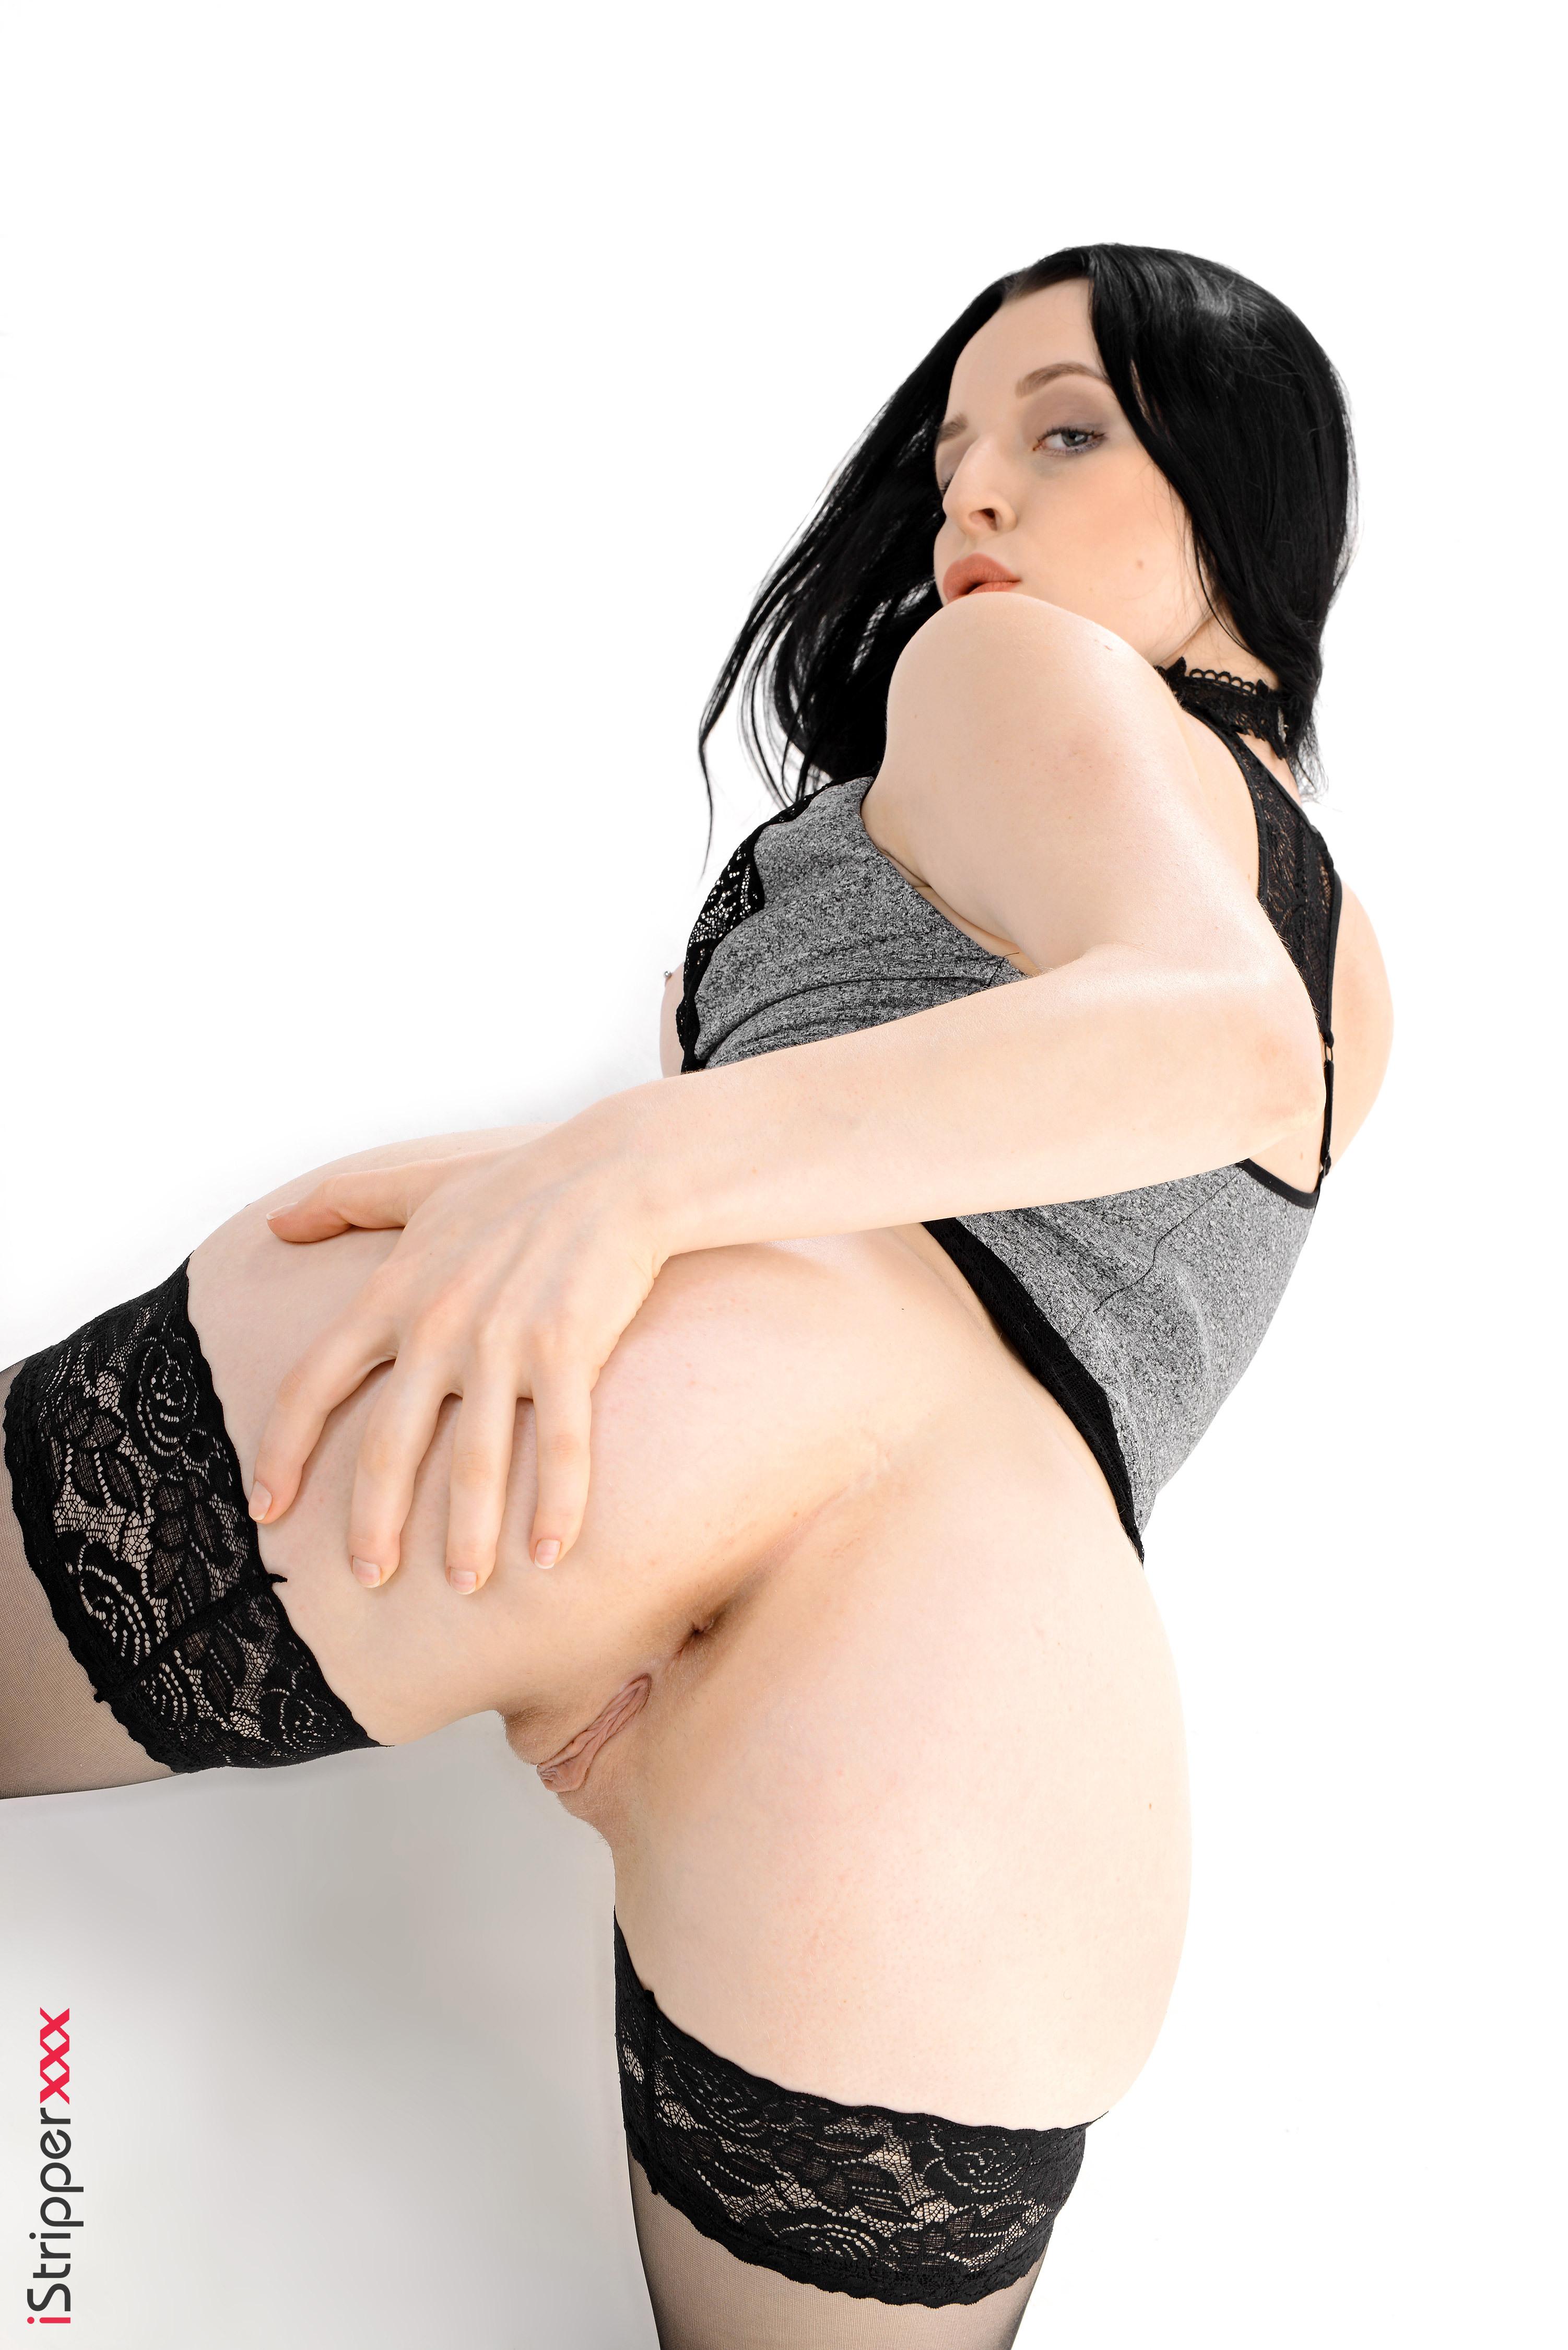 nude hot girls wallpapers